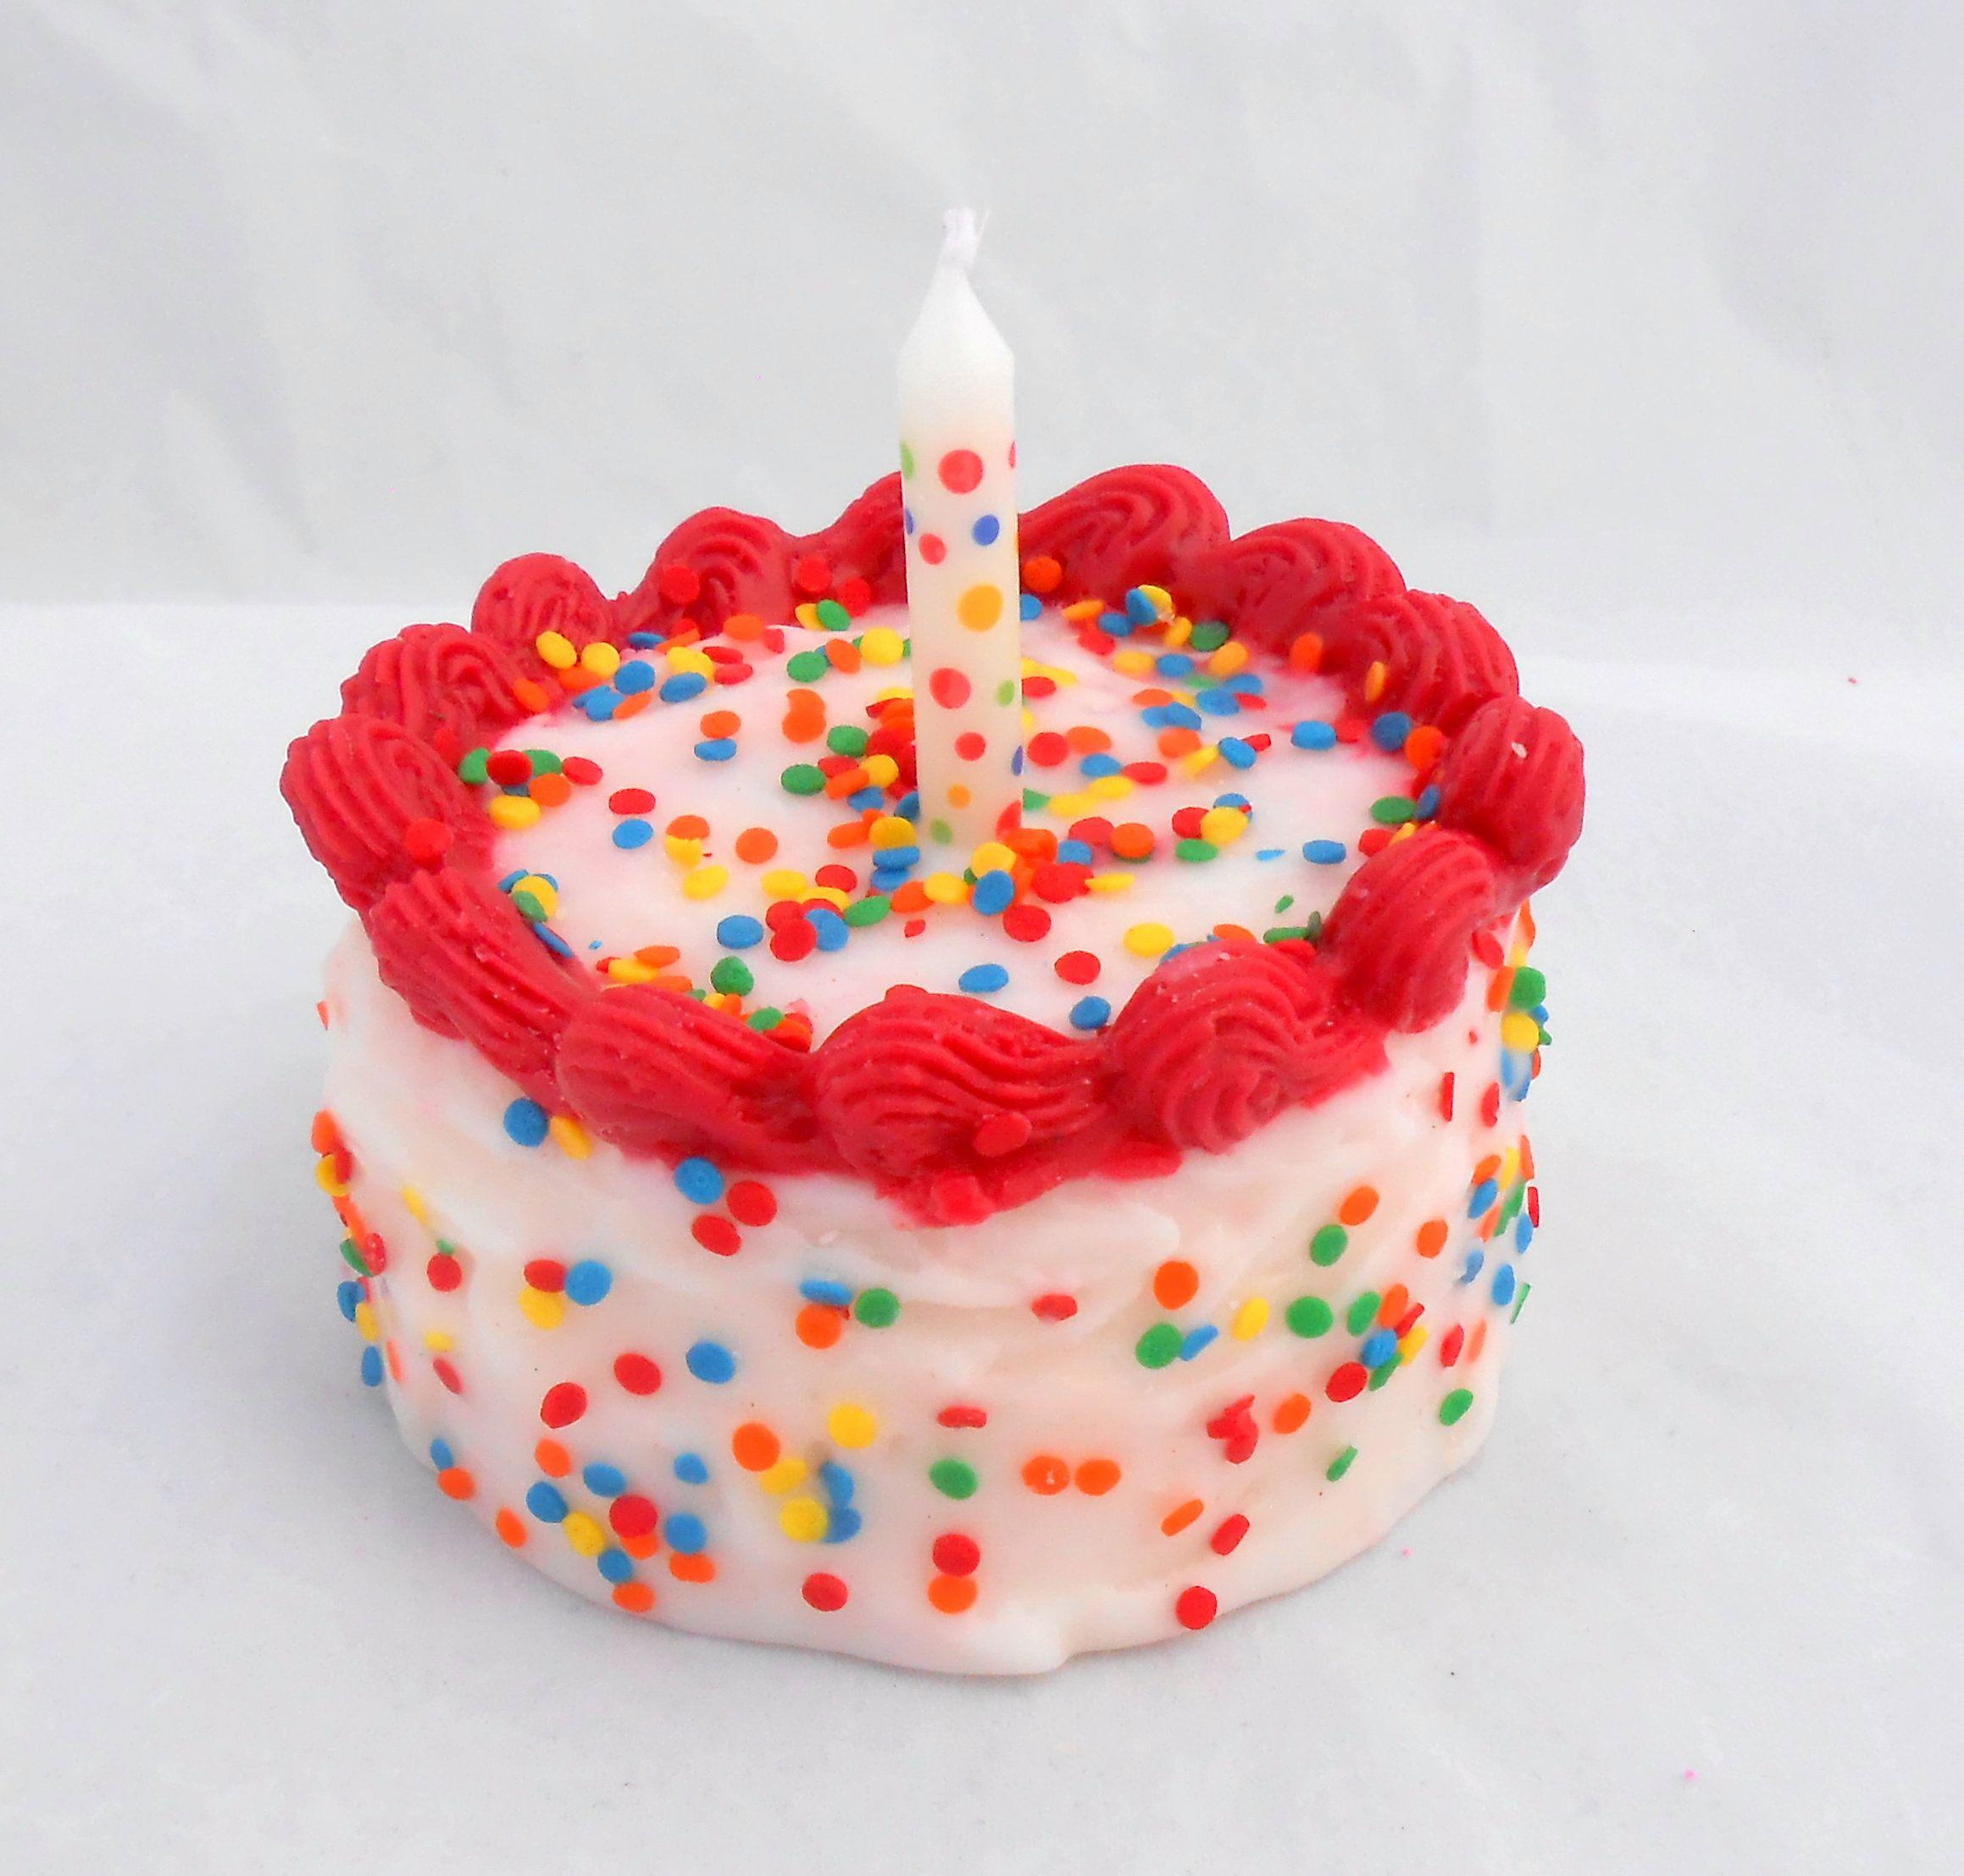 Buttercream Cupcake Cake Candle Birthday Cake Dessert Etsy Dessert Candles Birthday Cake With Candles Cupcake Cakes